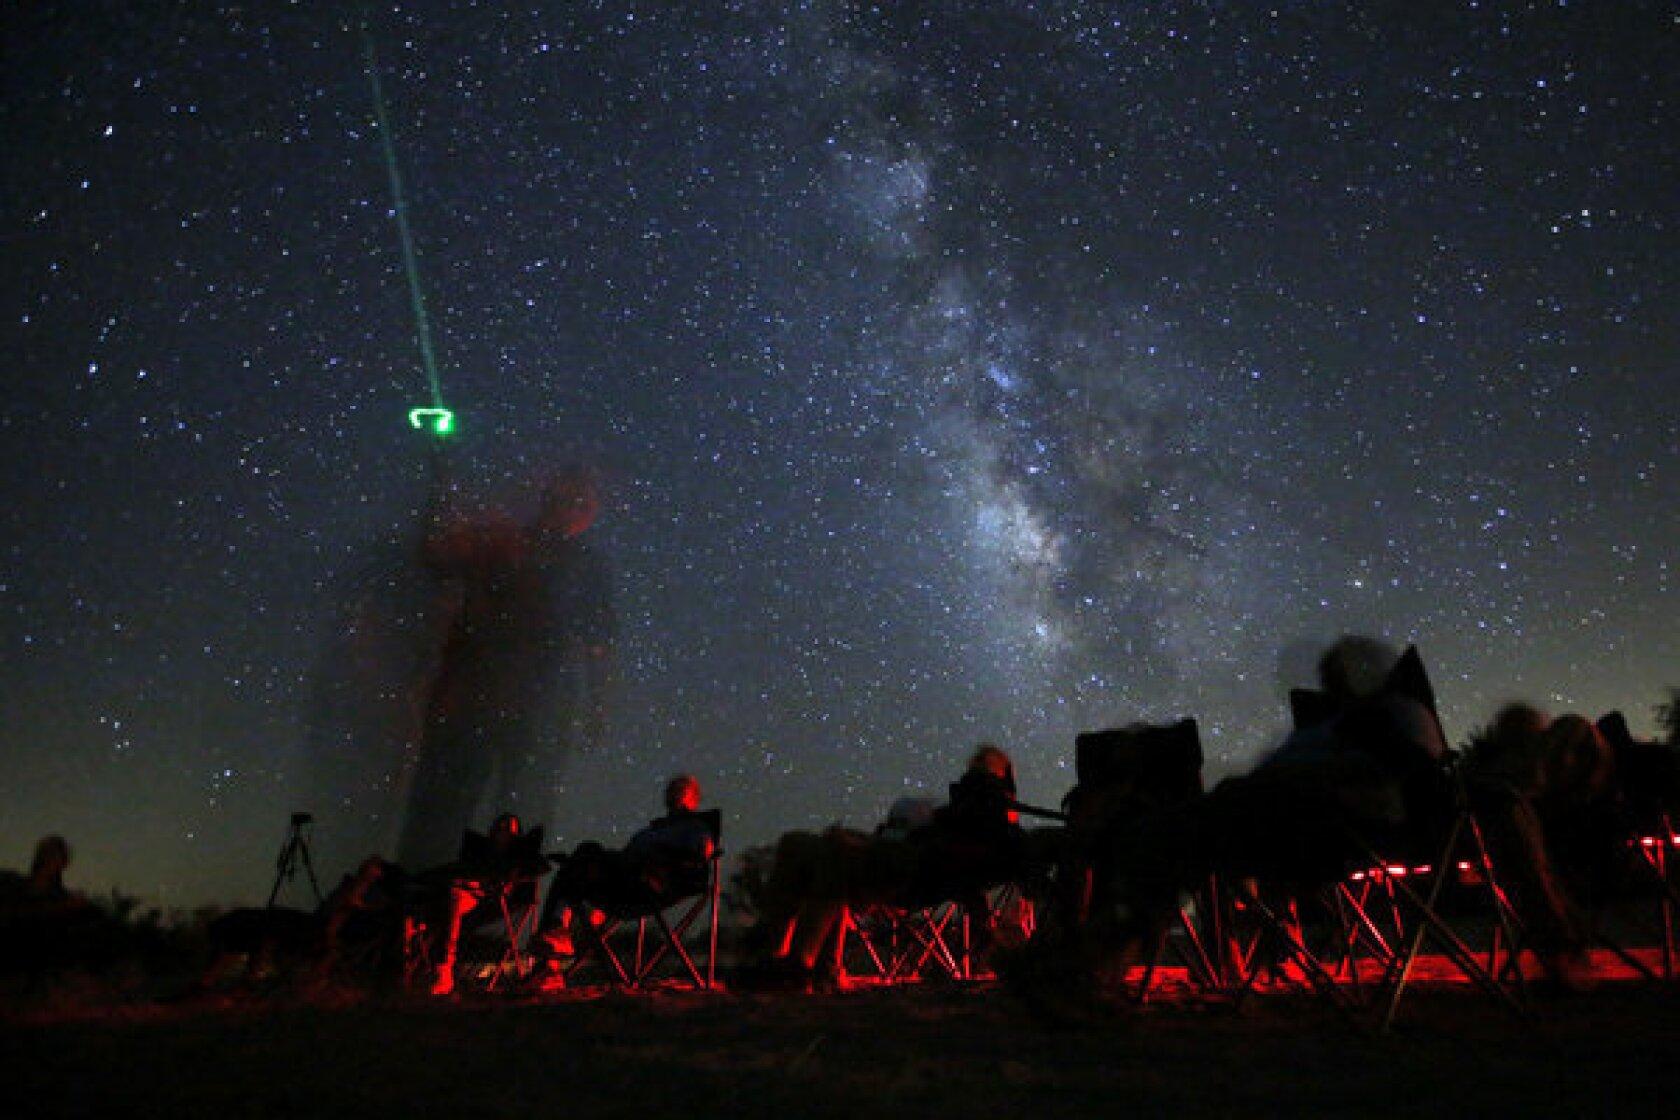 Perseids 2013: Meteor shower peaks again on last night to enjoy show